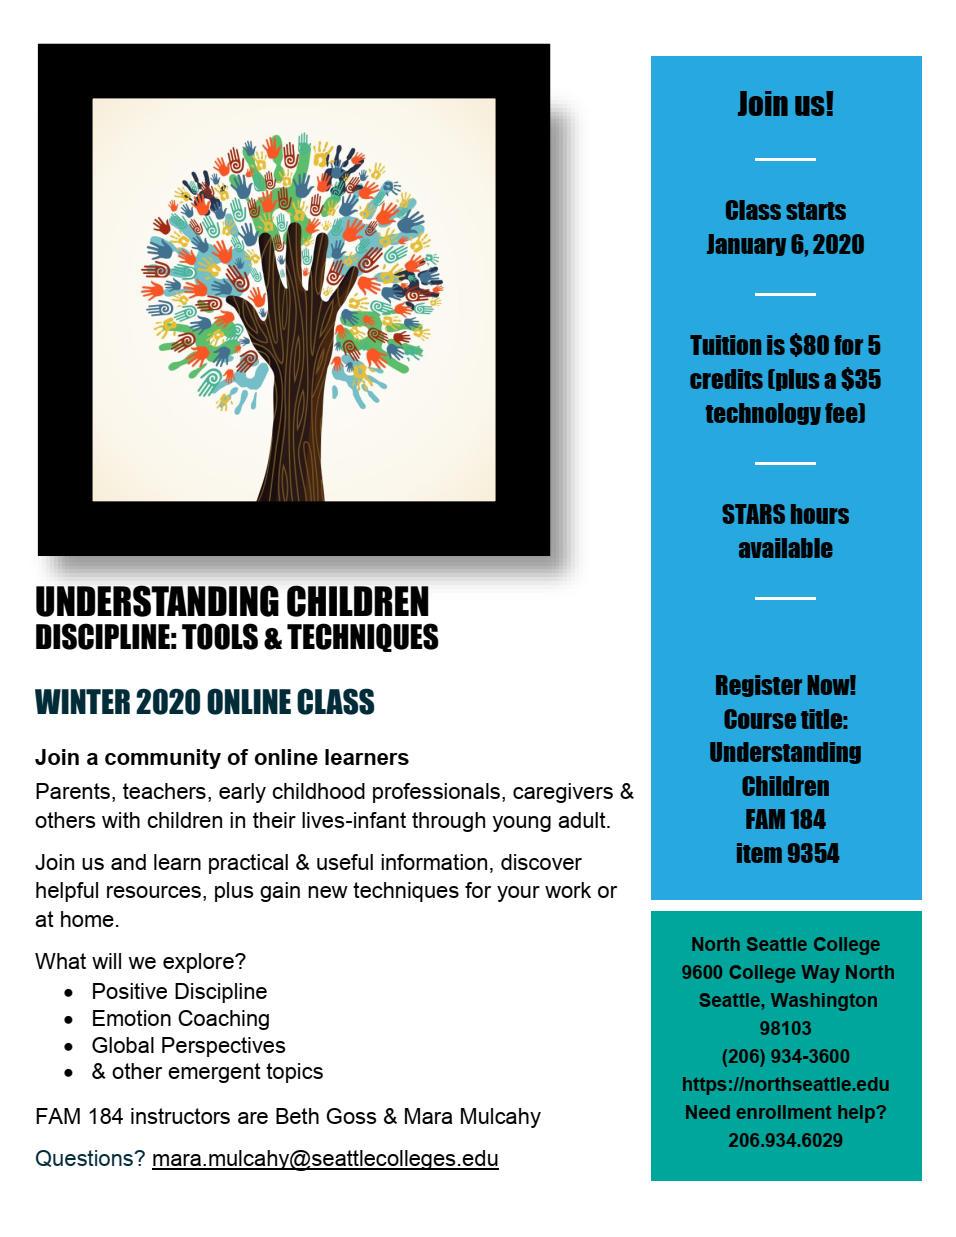 Winter 2020 Understanding Children Online Class Flyer